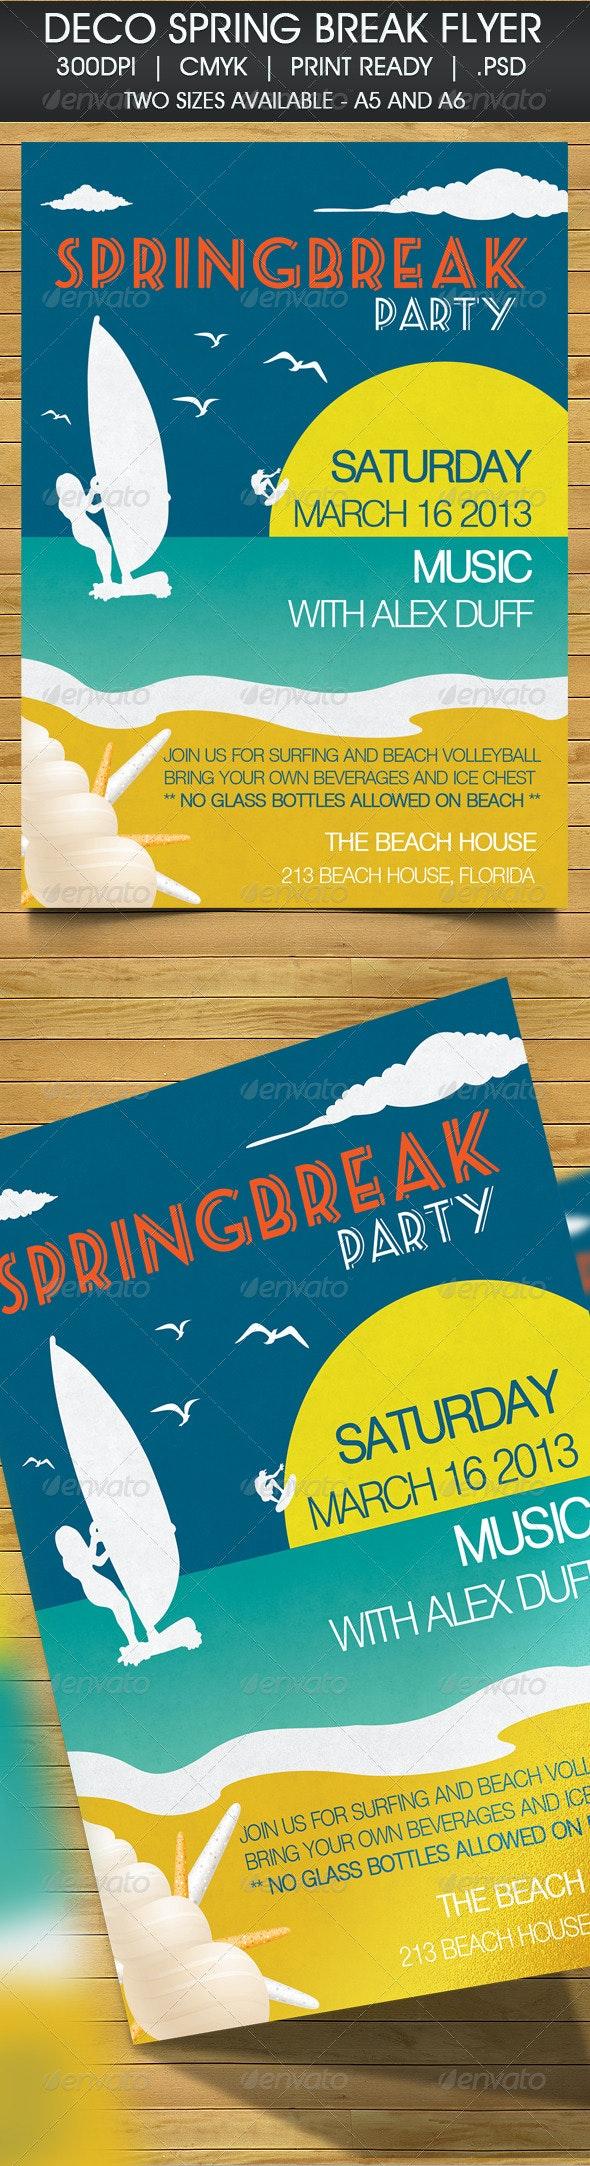 Deco Spring Break Beach Party Invitation - Cards & Invites Print Templates